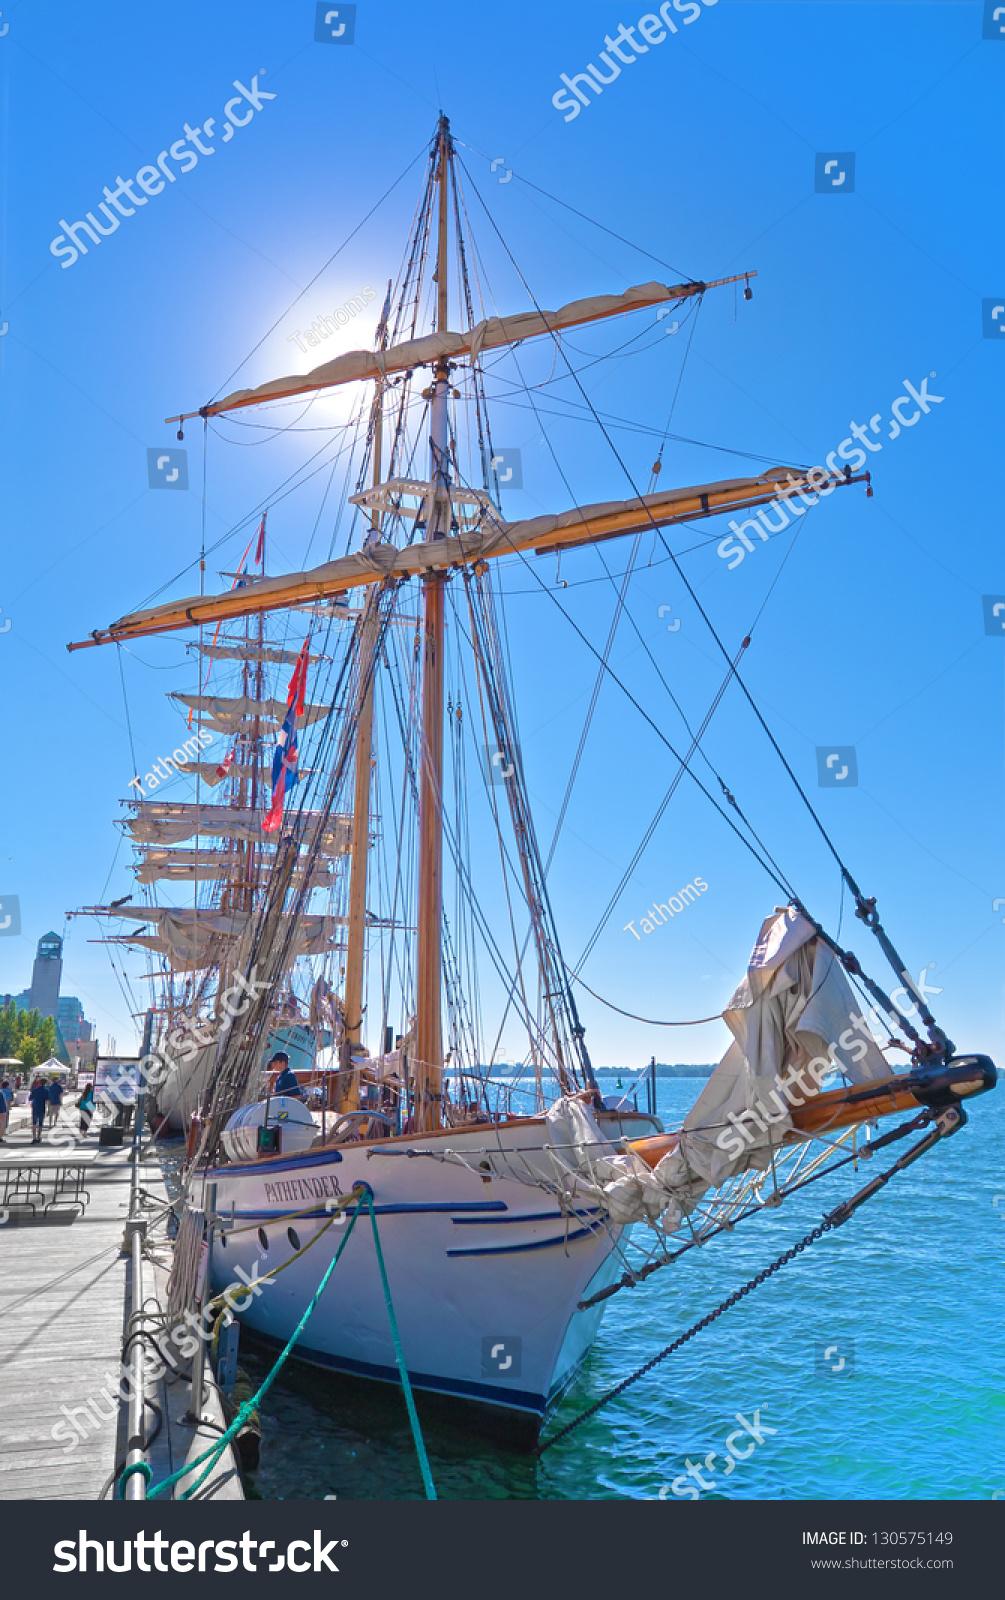 stock-photo-toronto-ontario-july-ship-pa